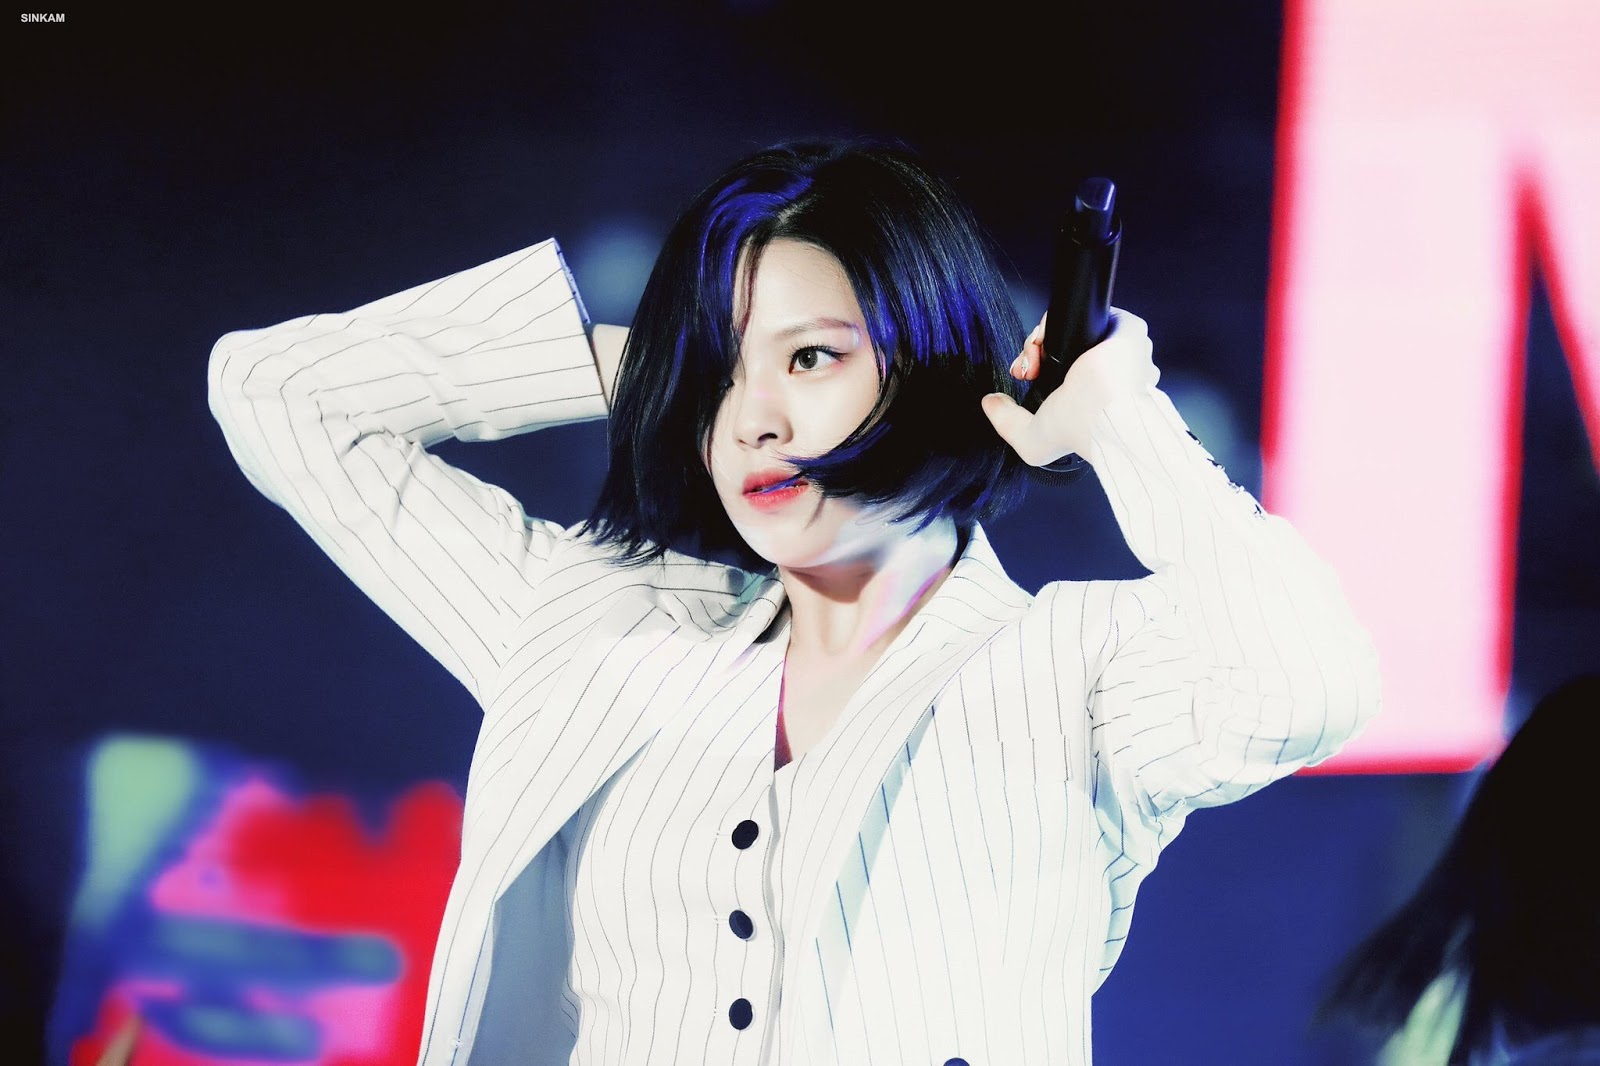 jeongyeon_lotte family concert_1